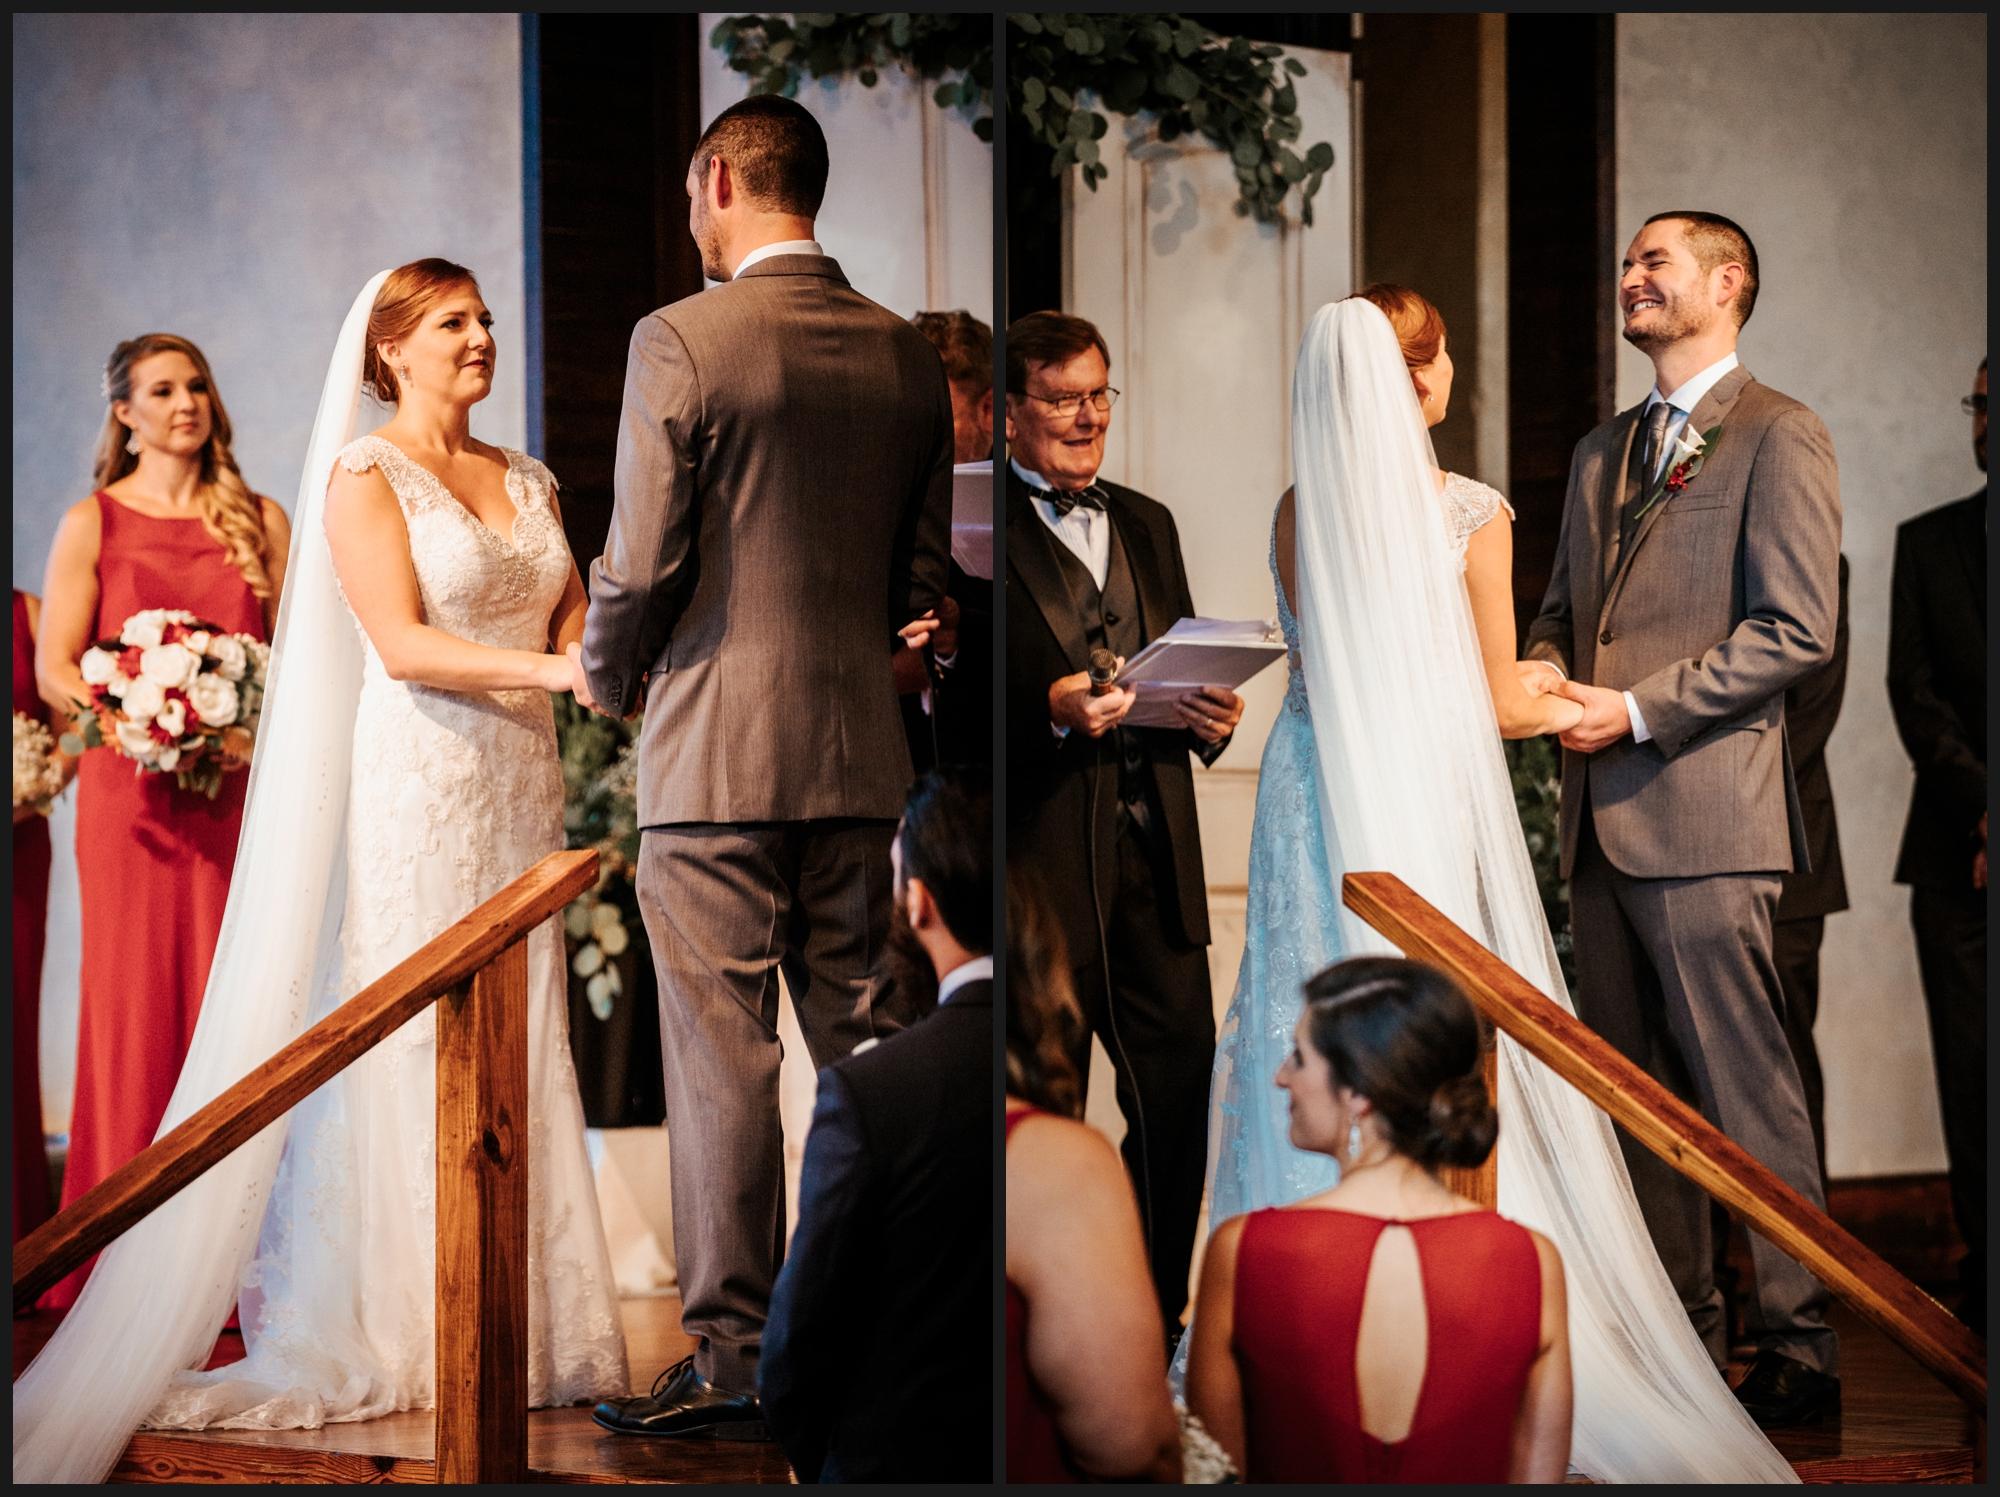 Orlando-Wedding-Photographer-destination-wedding-photographer-florida-wedding-photographer-bohemian-wedding-photographer_0561.jpg